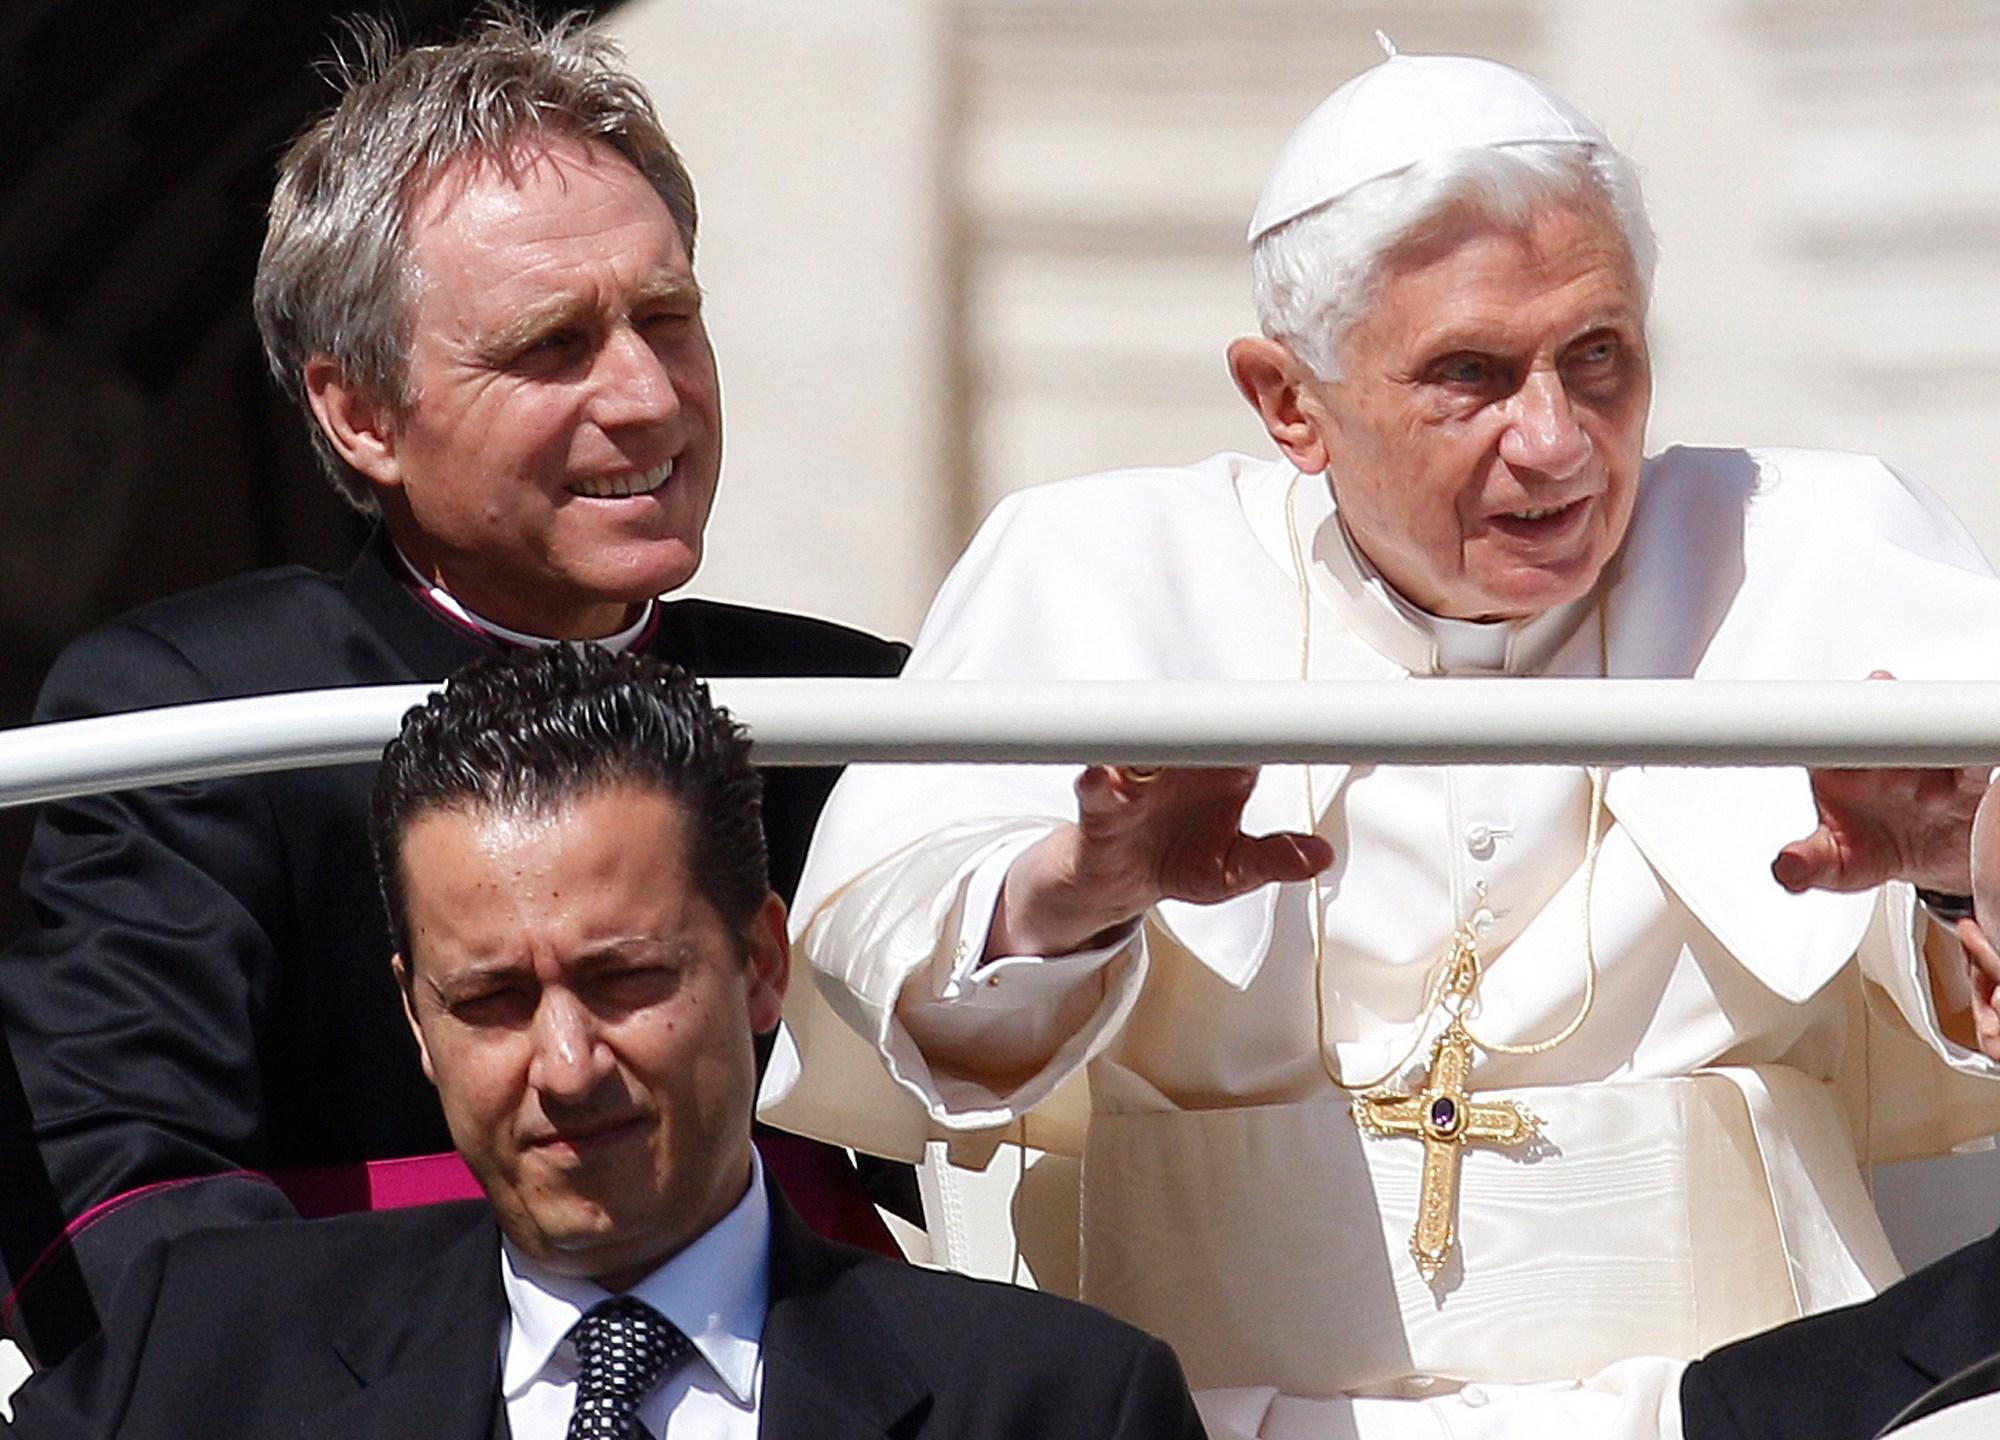 Pope Benedict XVI, Georg Gaenswein, Paolo Gabriele